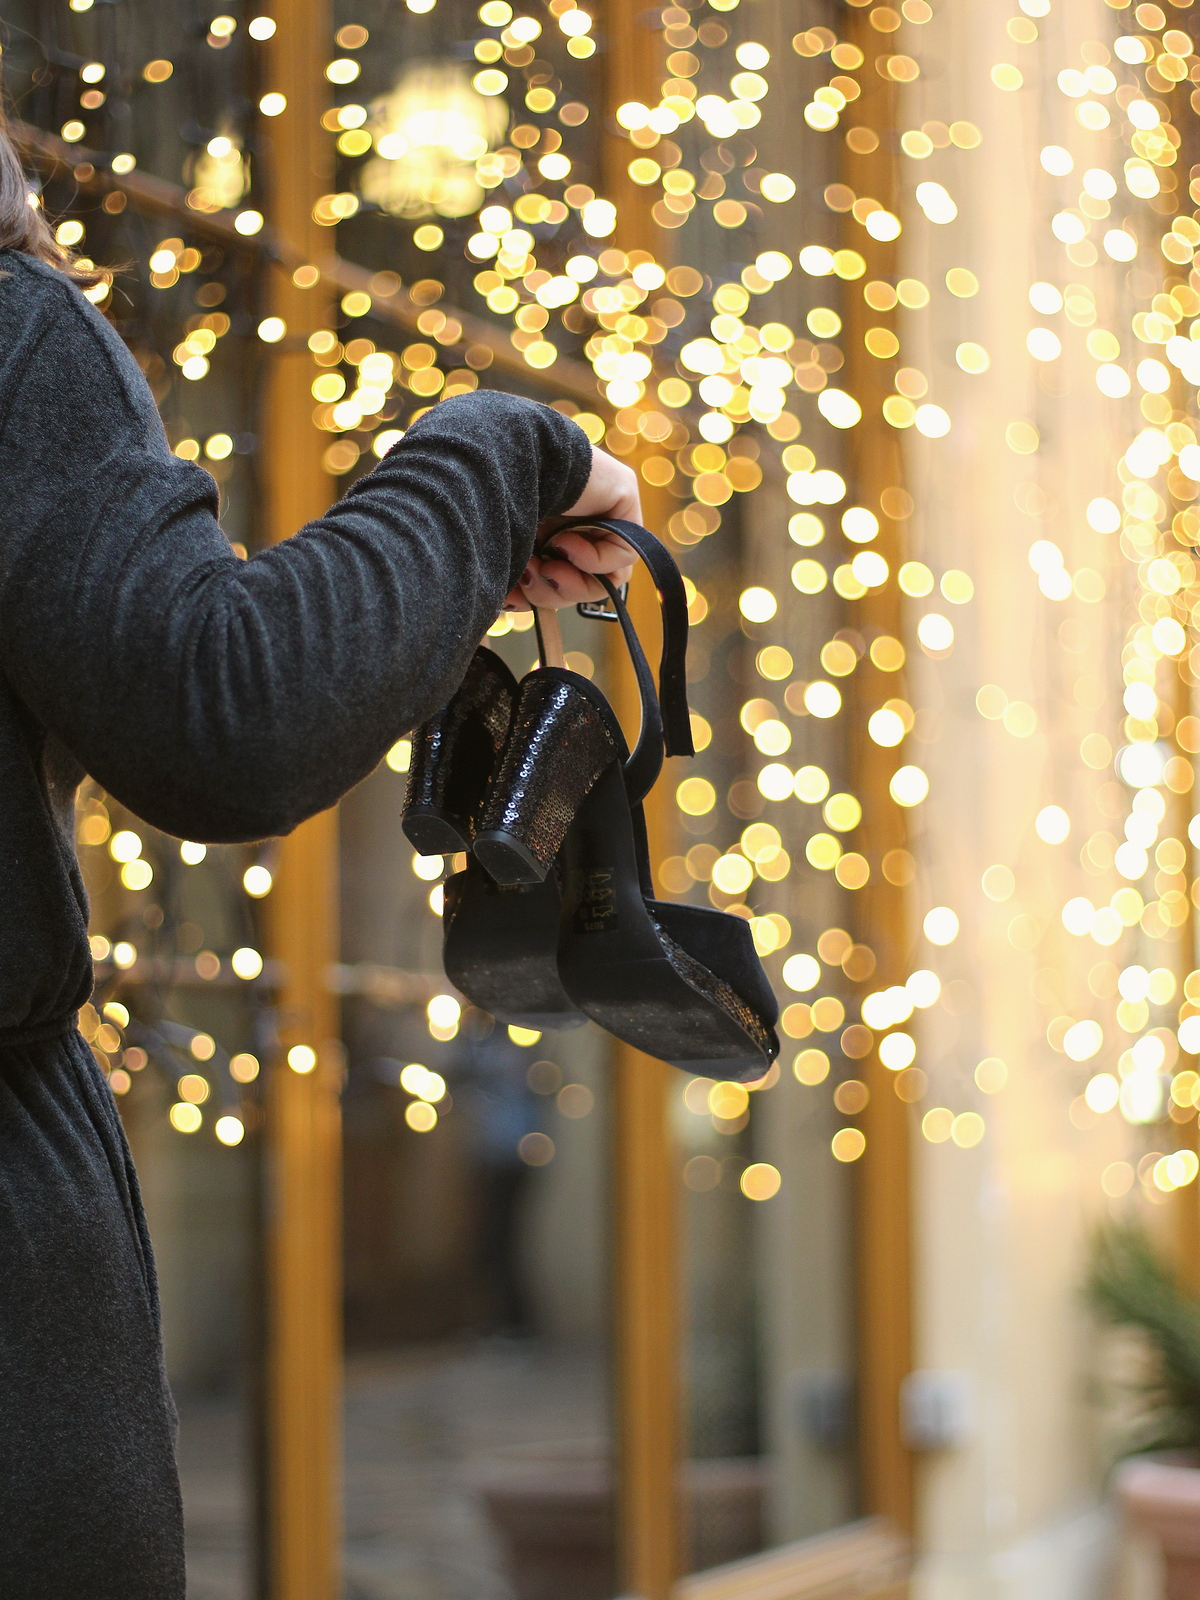 Christmas spirit - Galerie Vivienne - du style madame - noel - look - leï 1984 - andré chaussure